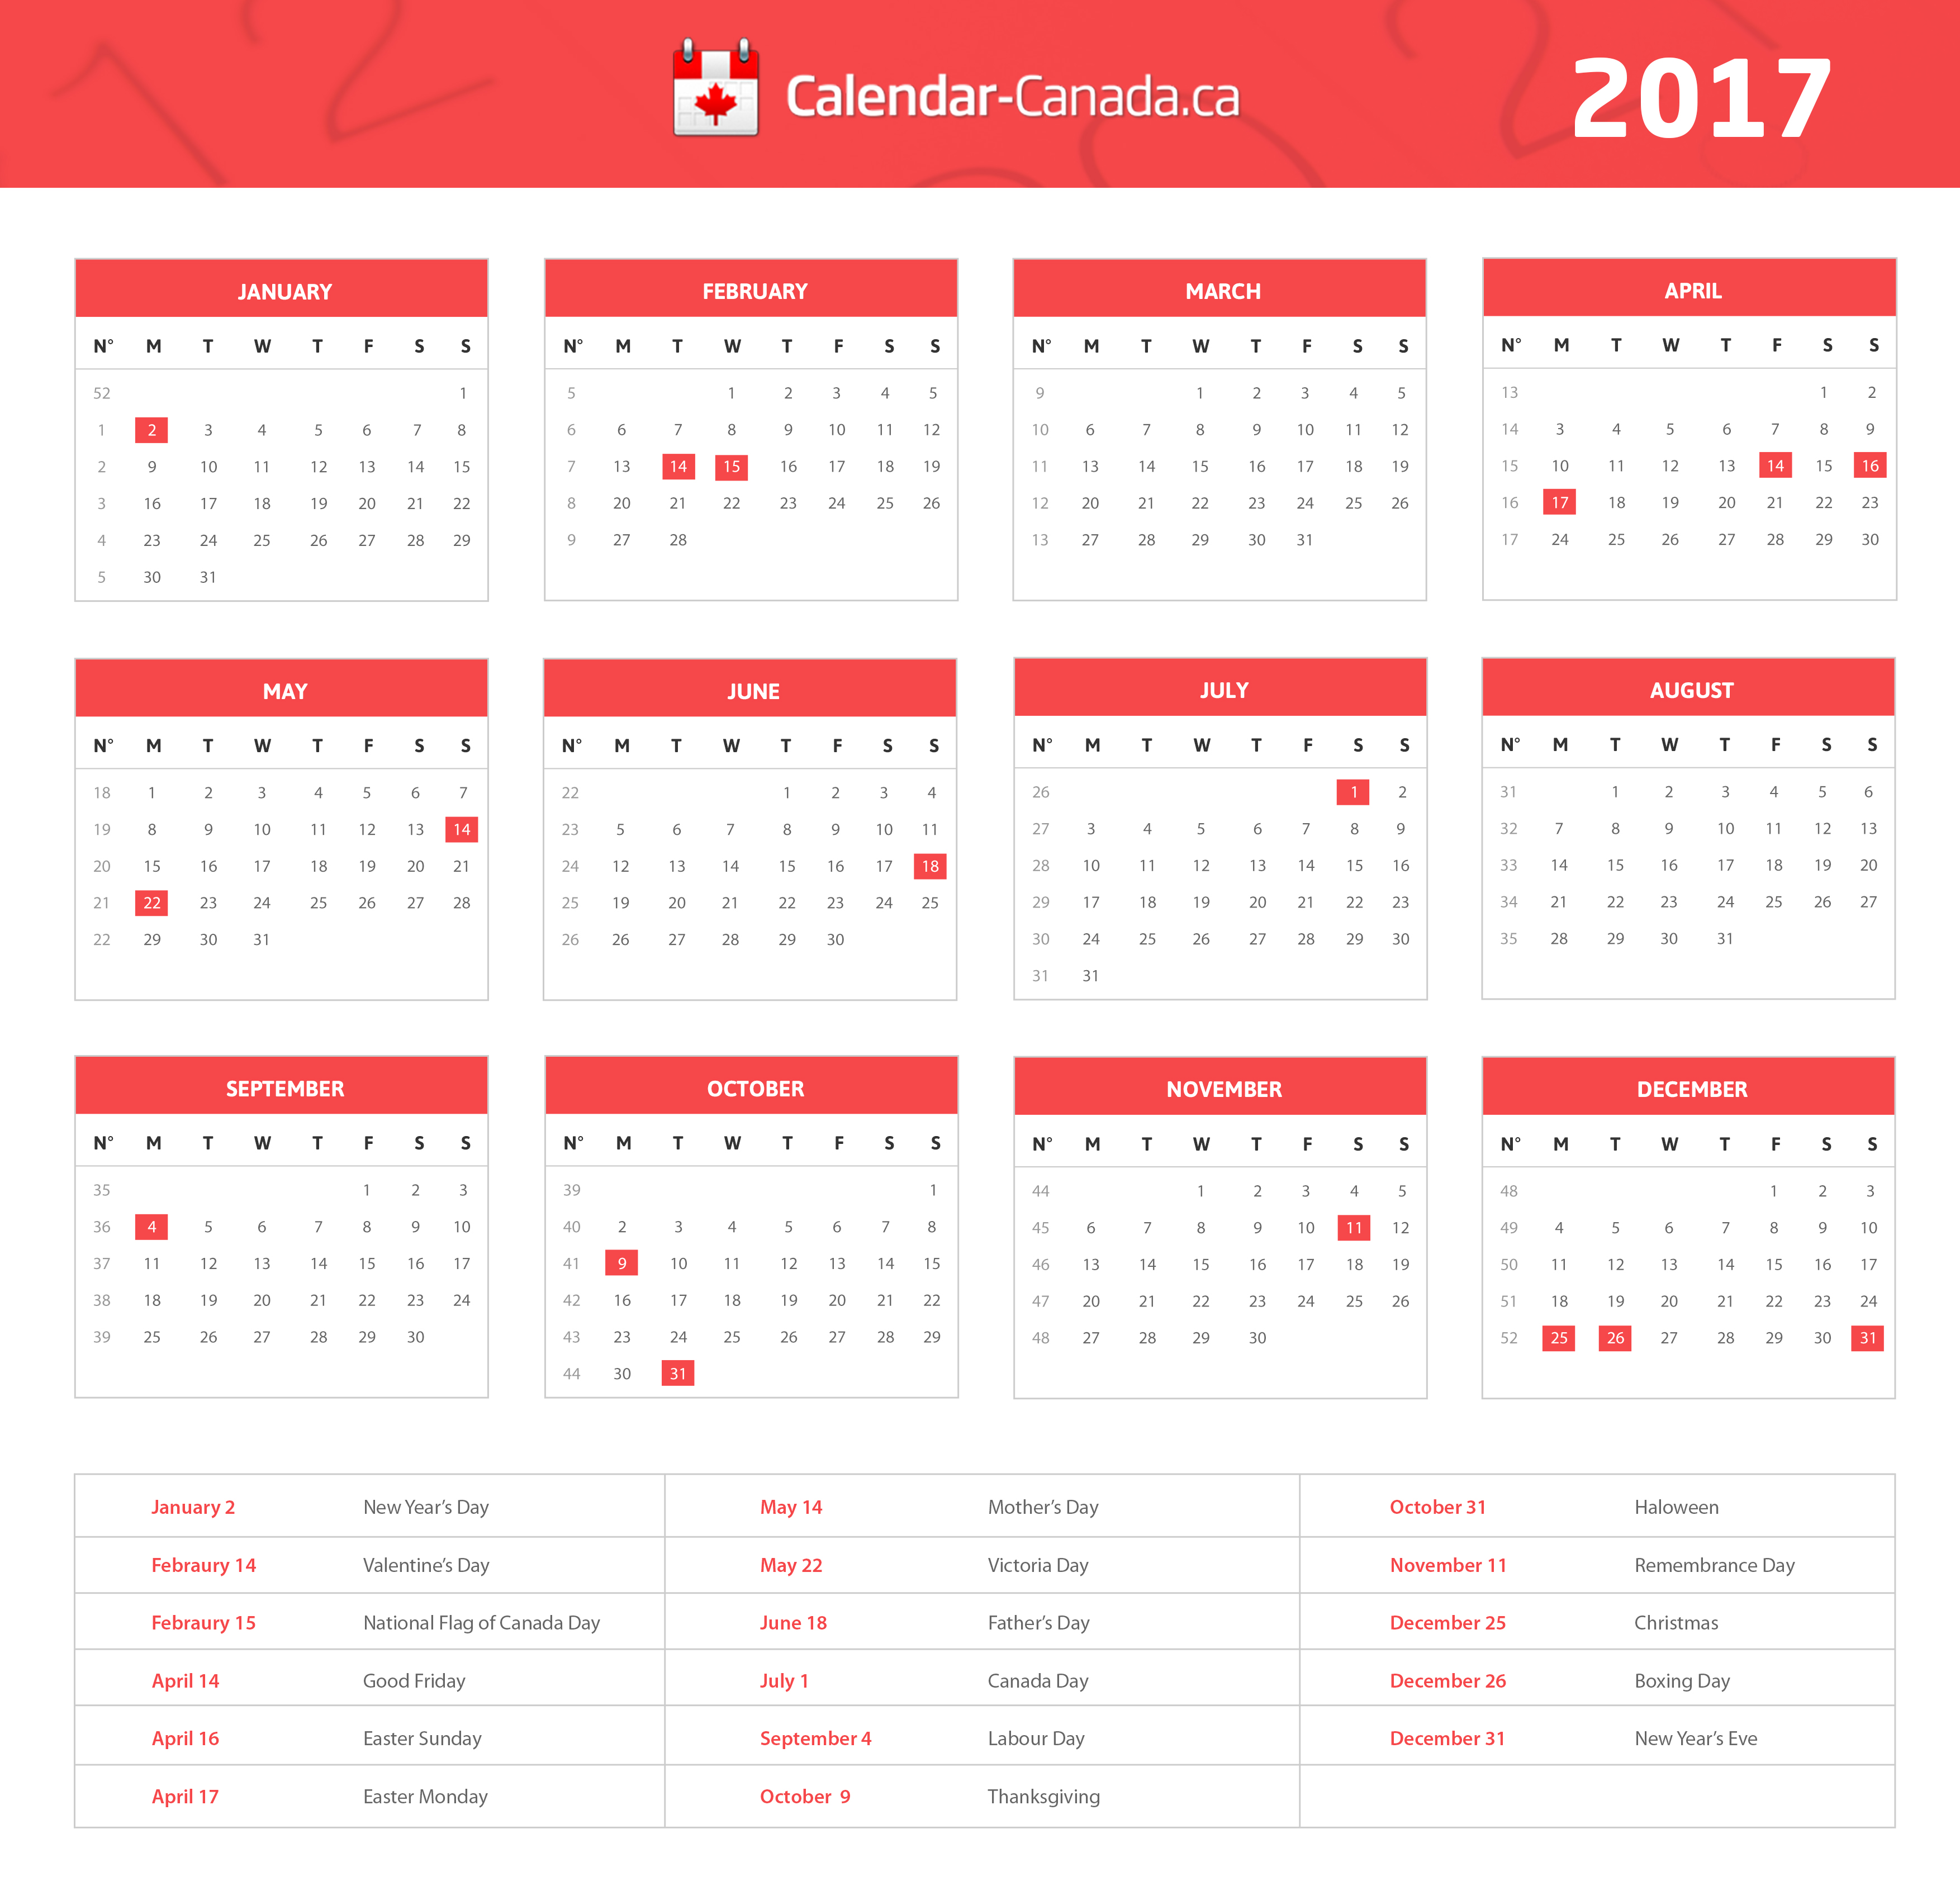 2022 calendar with canada holidays at bottom landscape layout. 2022 Holidays In Canada - Nexta